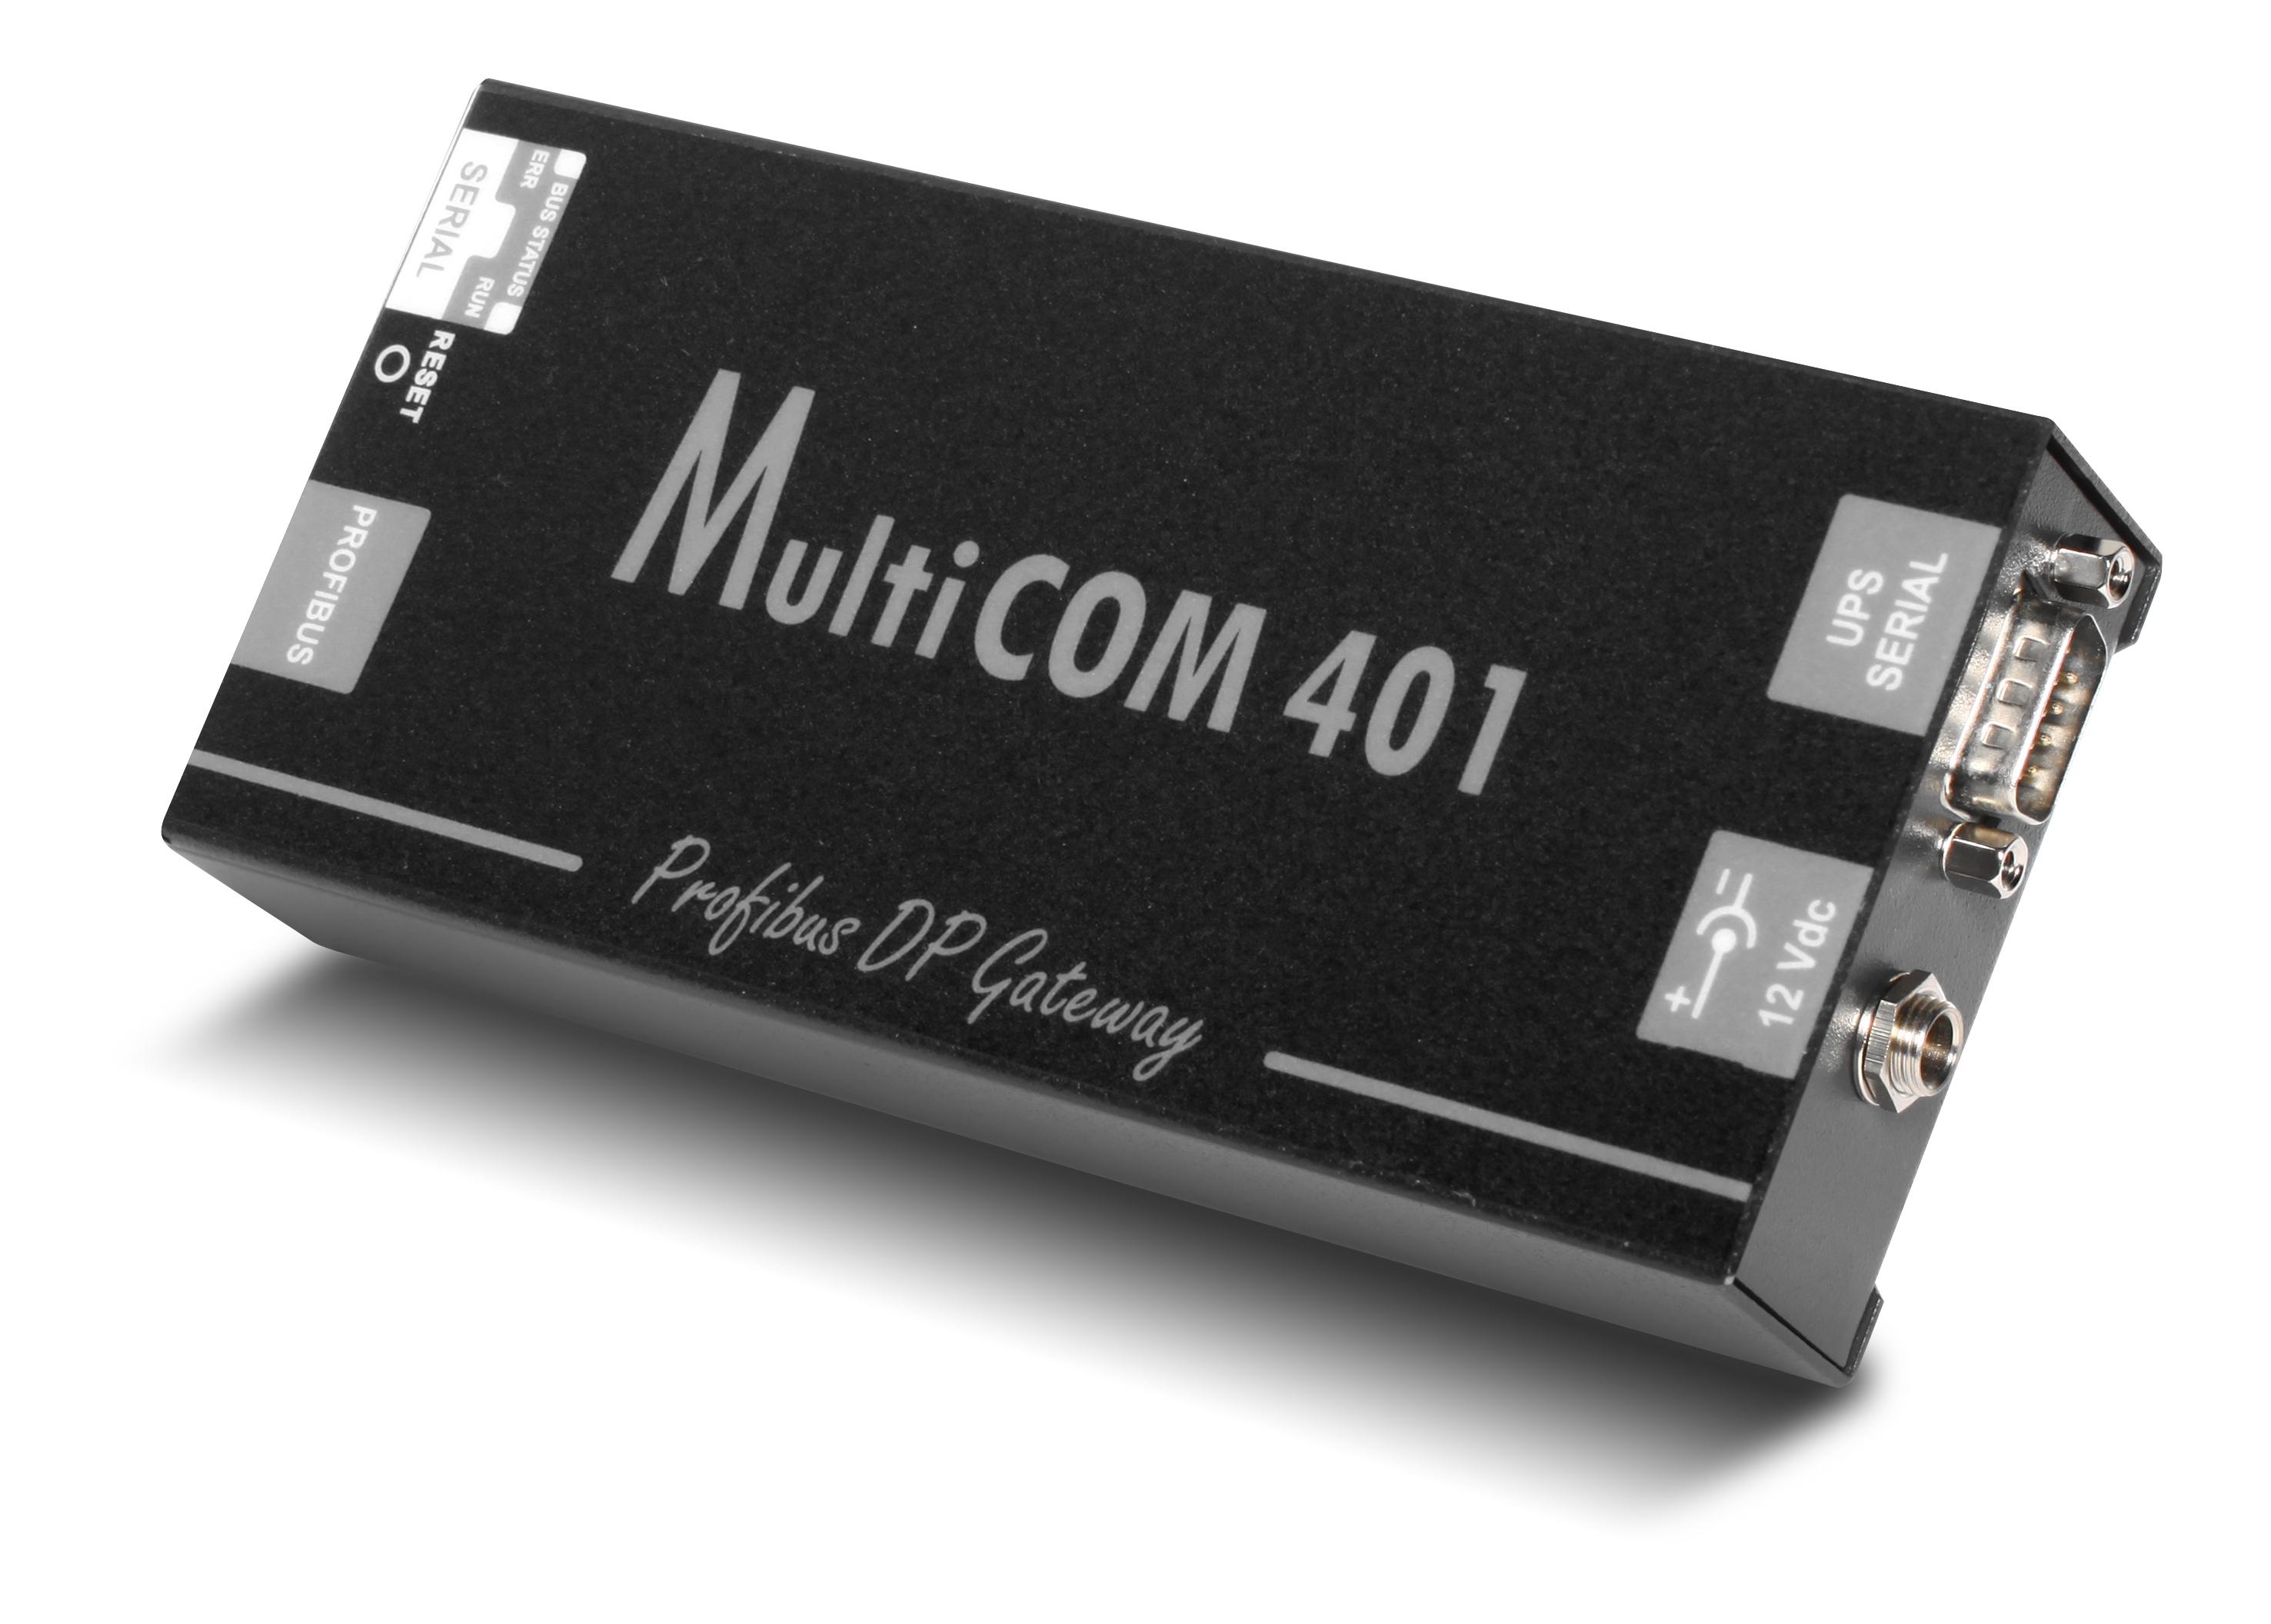 1 Stk Profibus USV Interface (DP-V1, Profidrive V2 PP05) -Boxausf. USMULTI401